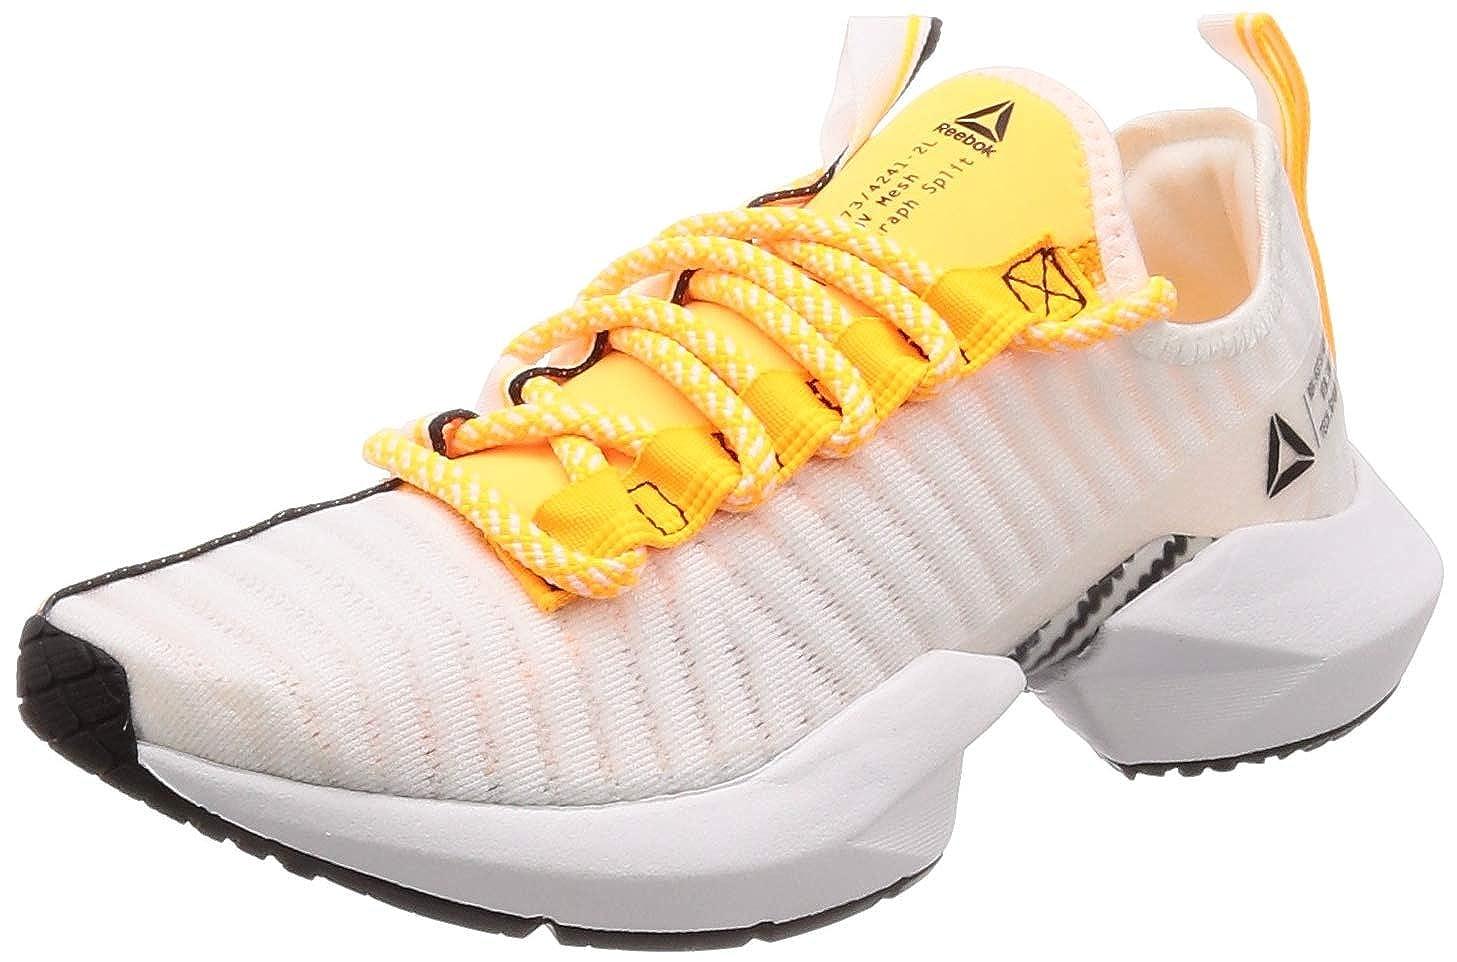 Justicia Laboratorio Descripción  Buy Reebok Women's Sole Fury SE White/Black/Solar Gold Running Shoes-4 UK ( 37 EU) (6.5 US) (DV6923) at Amazon.in